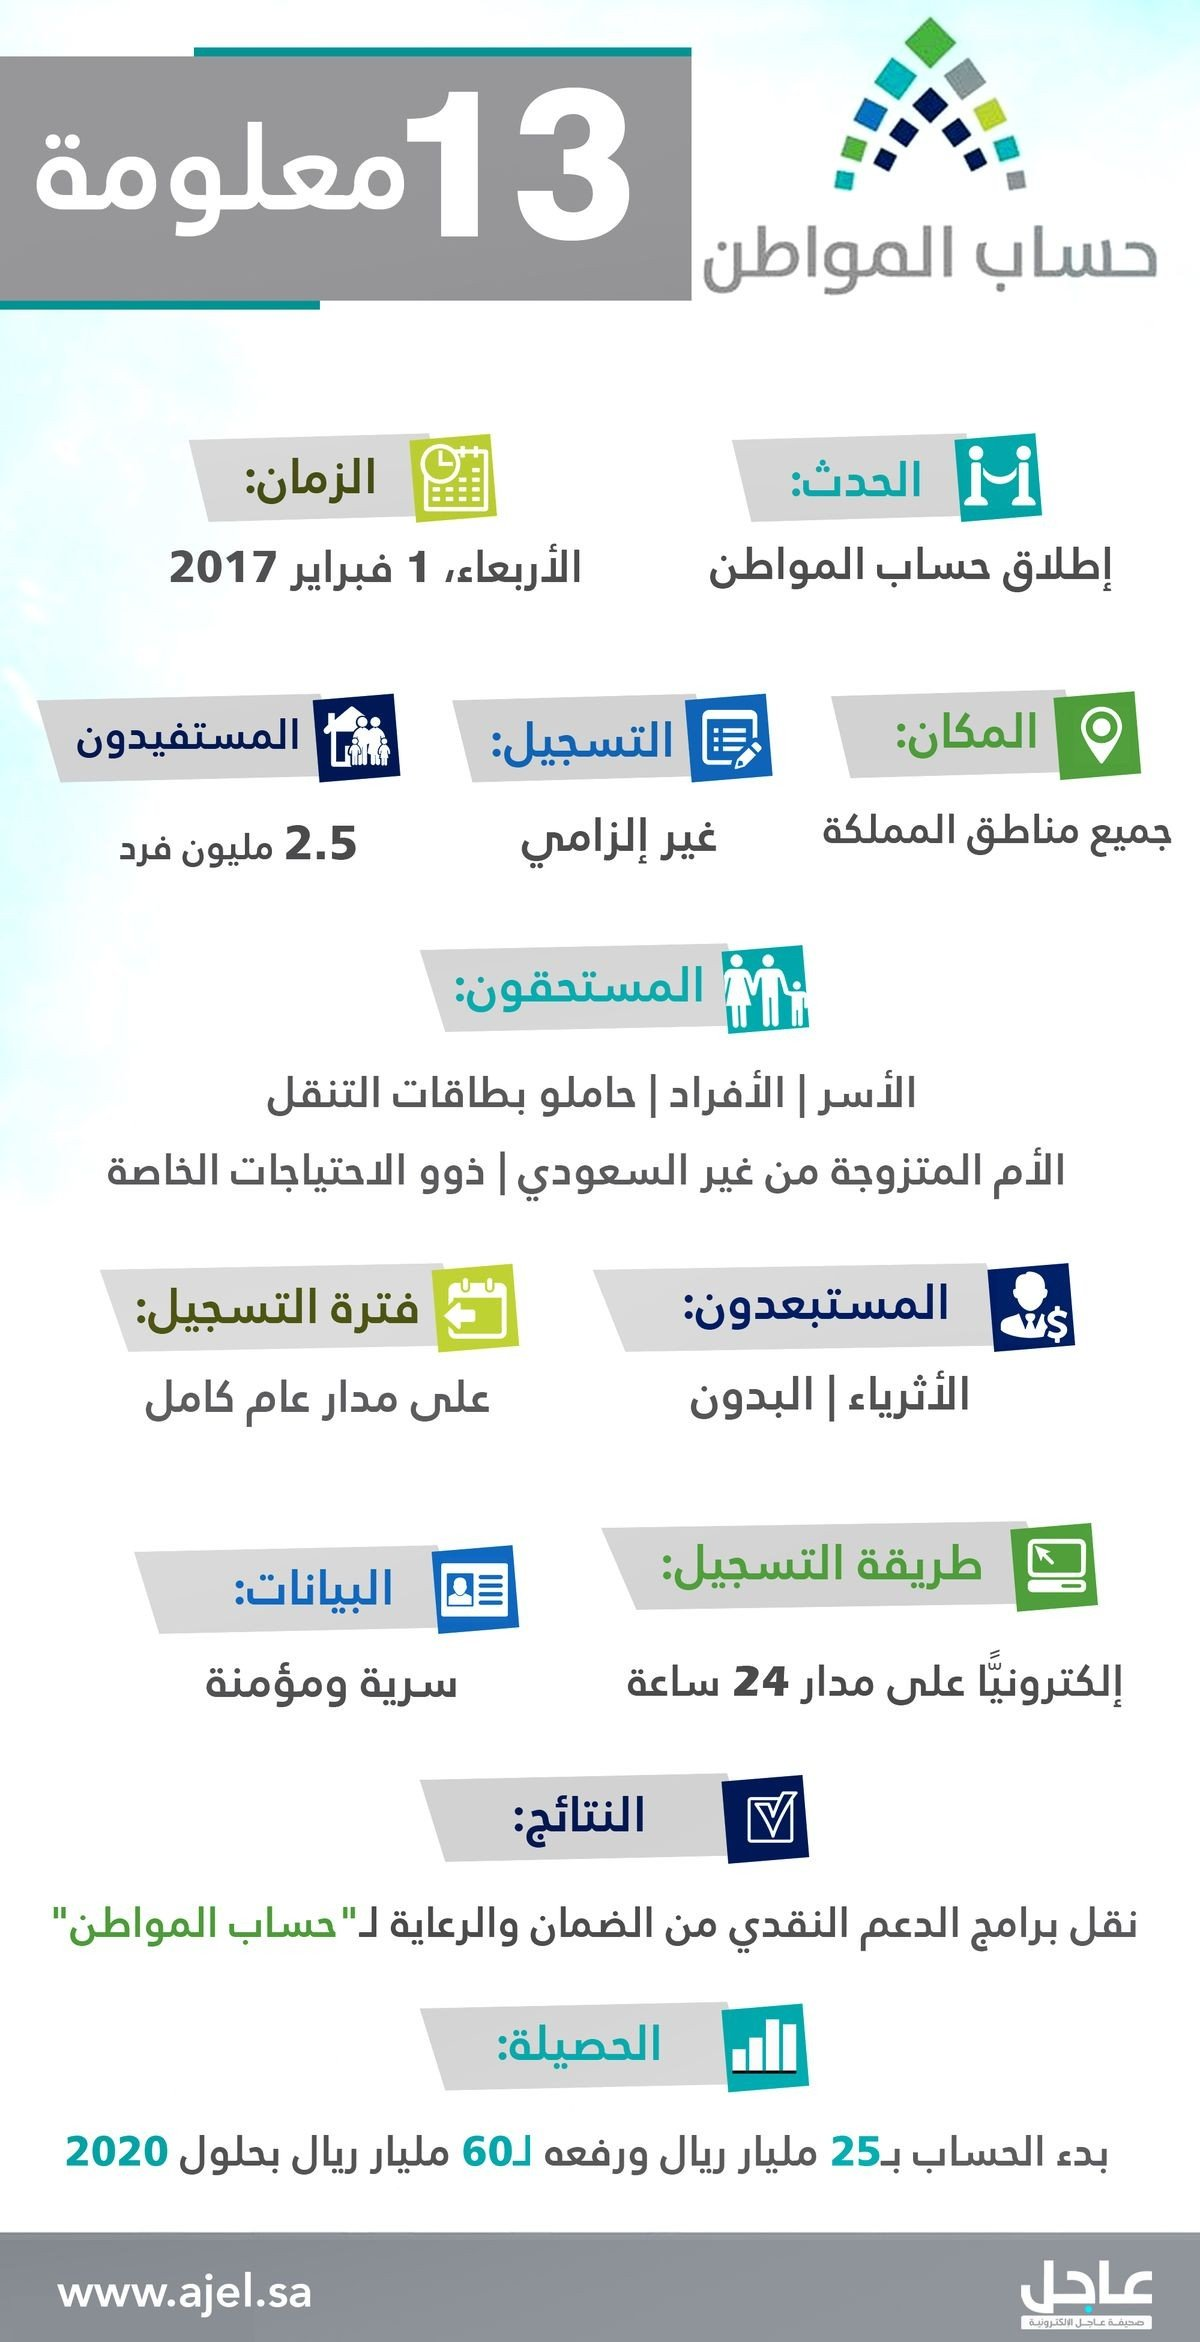 Fay3 حساب المواطن في السعودية انفوجرافيك انفوجرافيك عربي